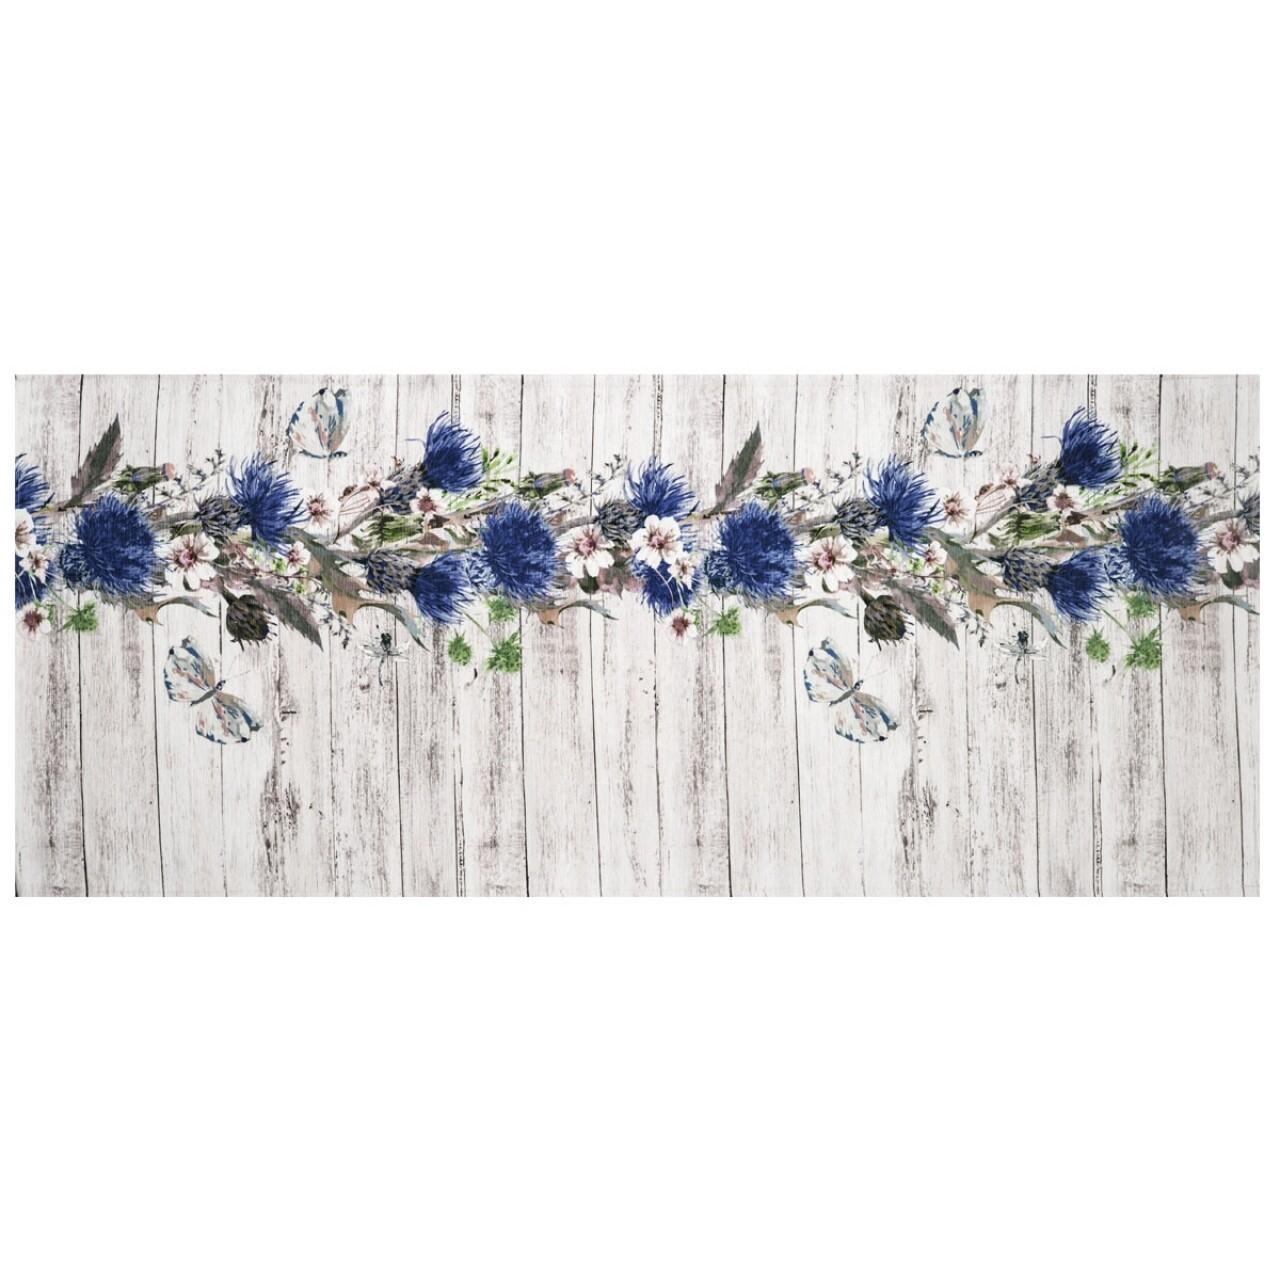 Covor rezistent Webtappeti Fiori Selvatici 58 x 240 cm, multicolor